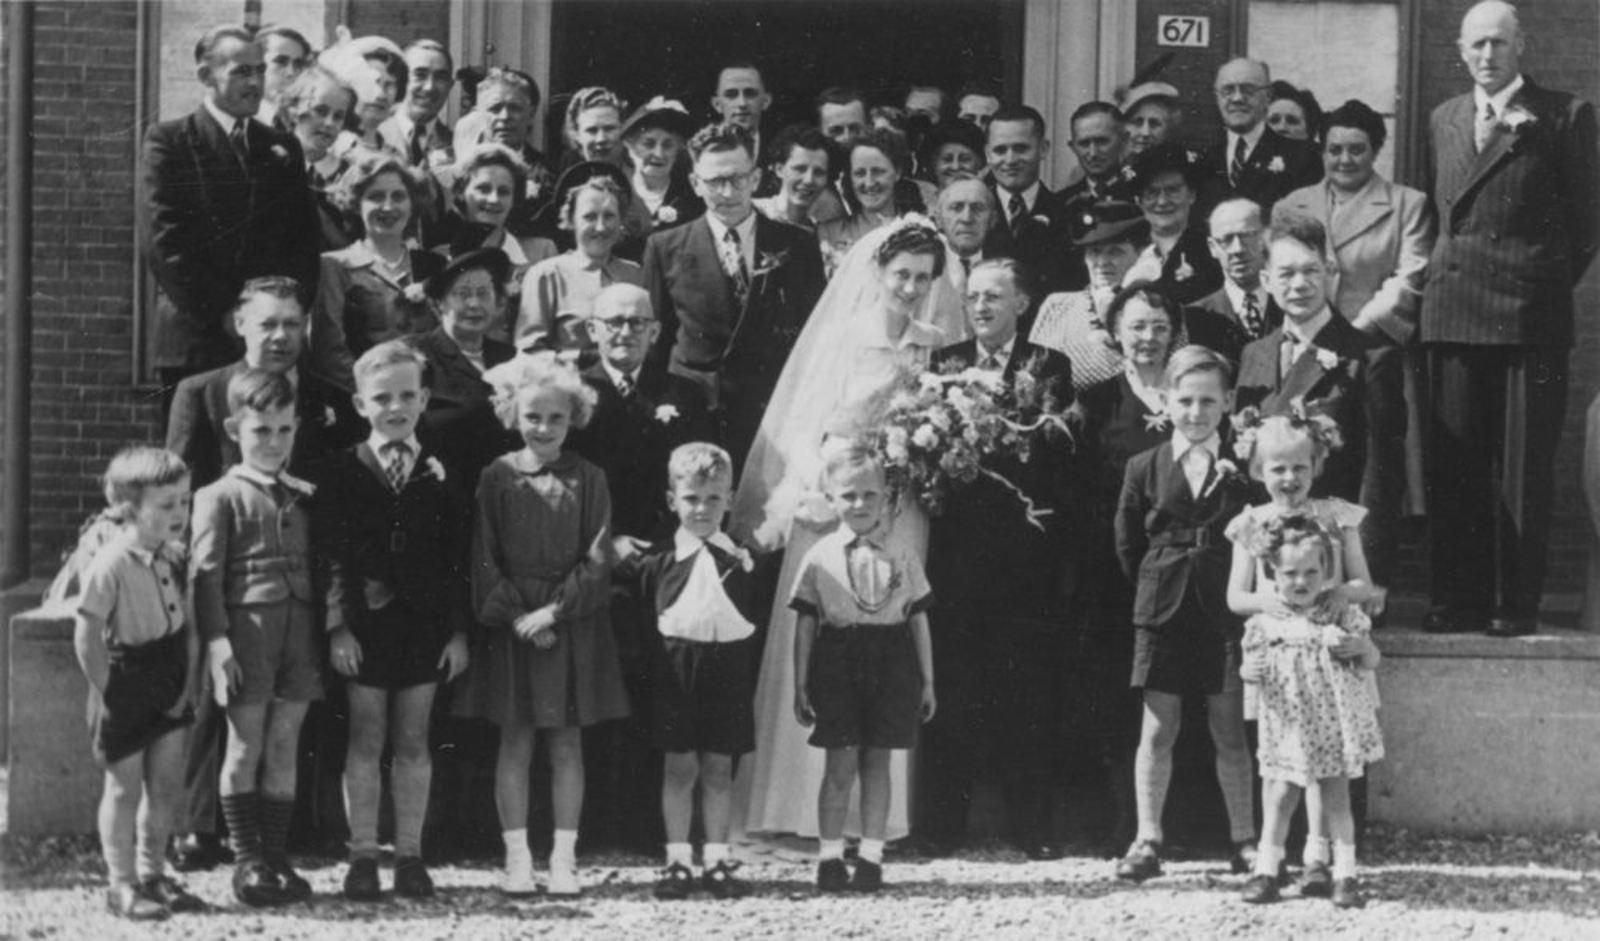 Broere Wim 1929 19__ trouwt met Lenie Lagrouw 02